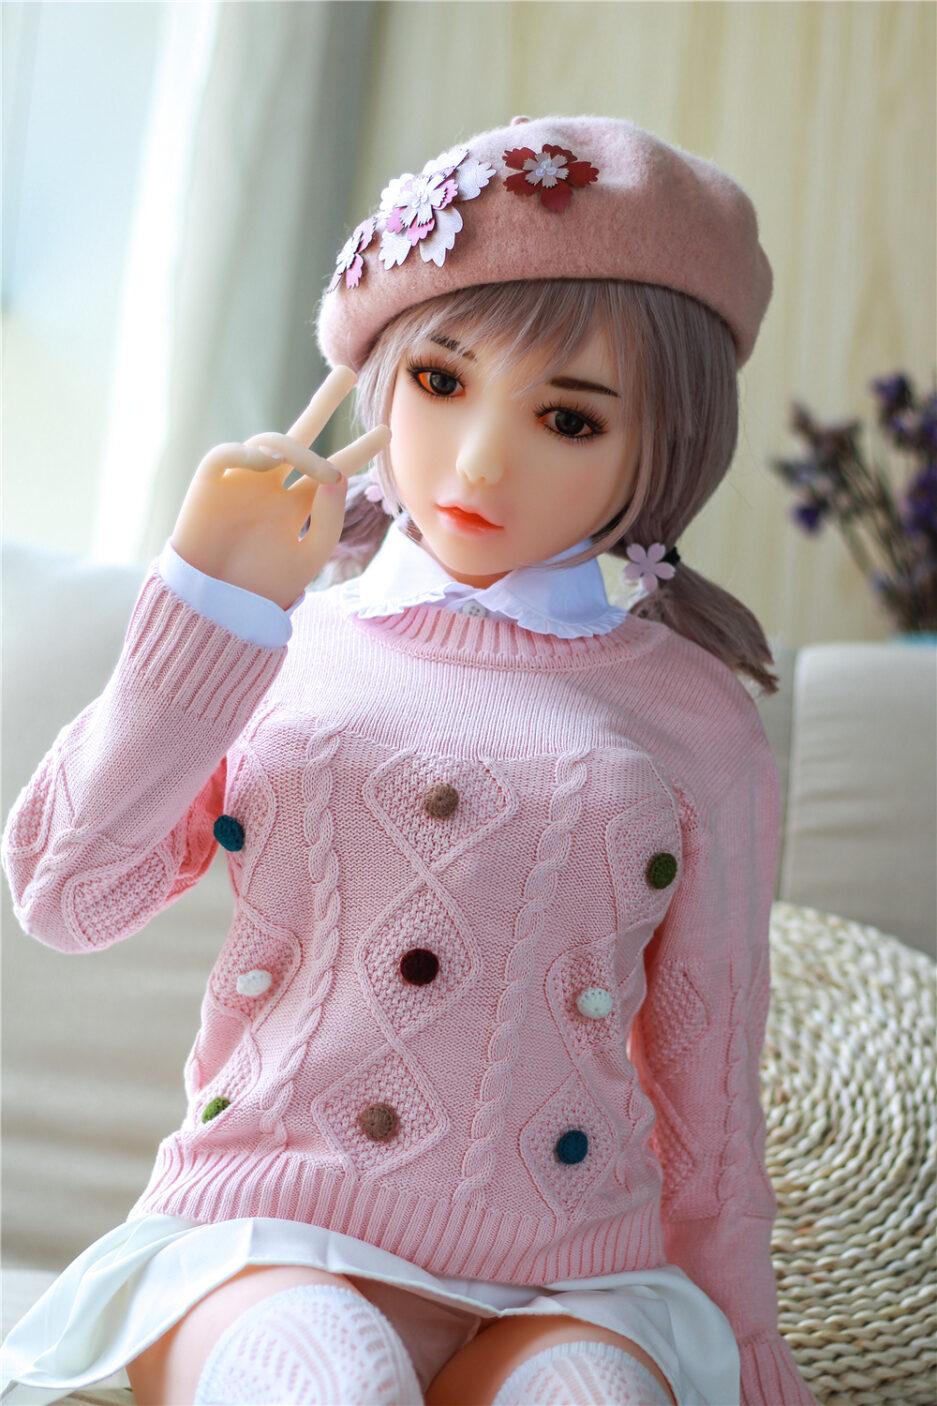 Cute-sex-doll-thinking